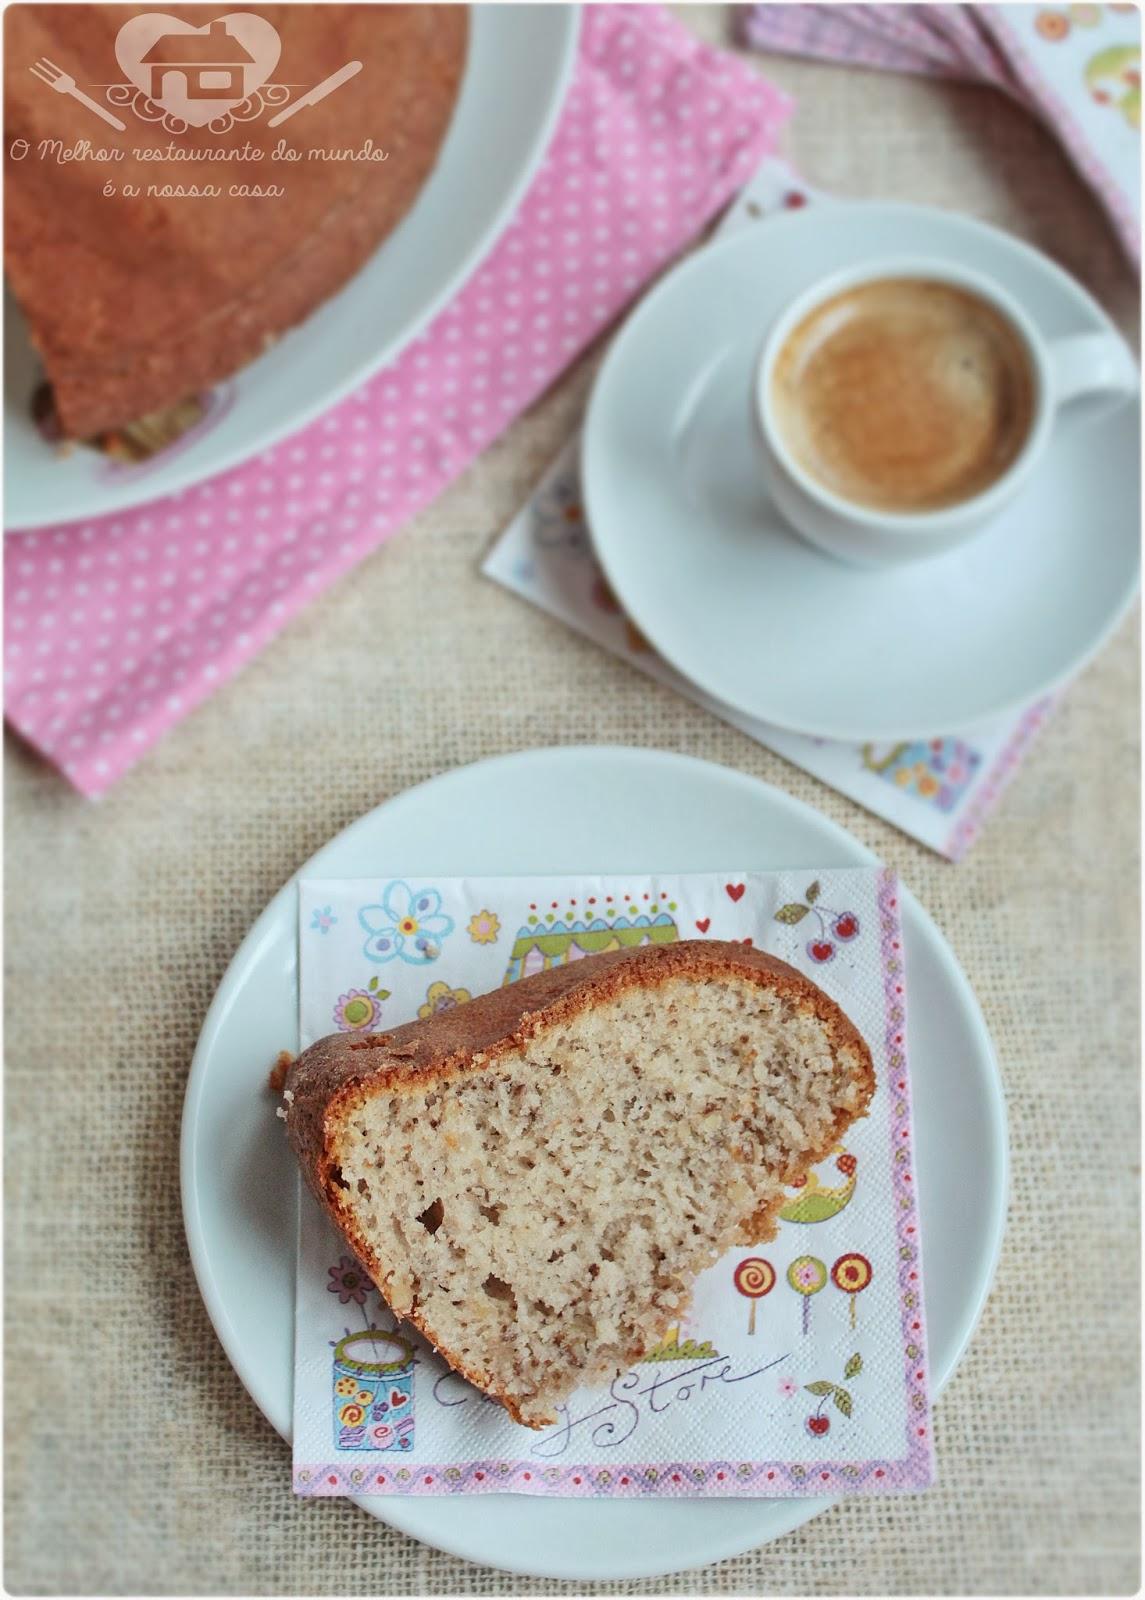 Receita fácil de bolo de nozes com cream cheese para o lanche da tarde